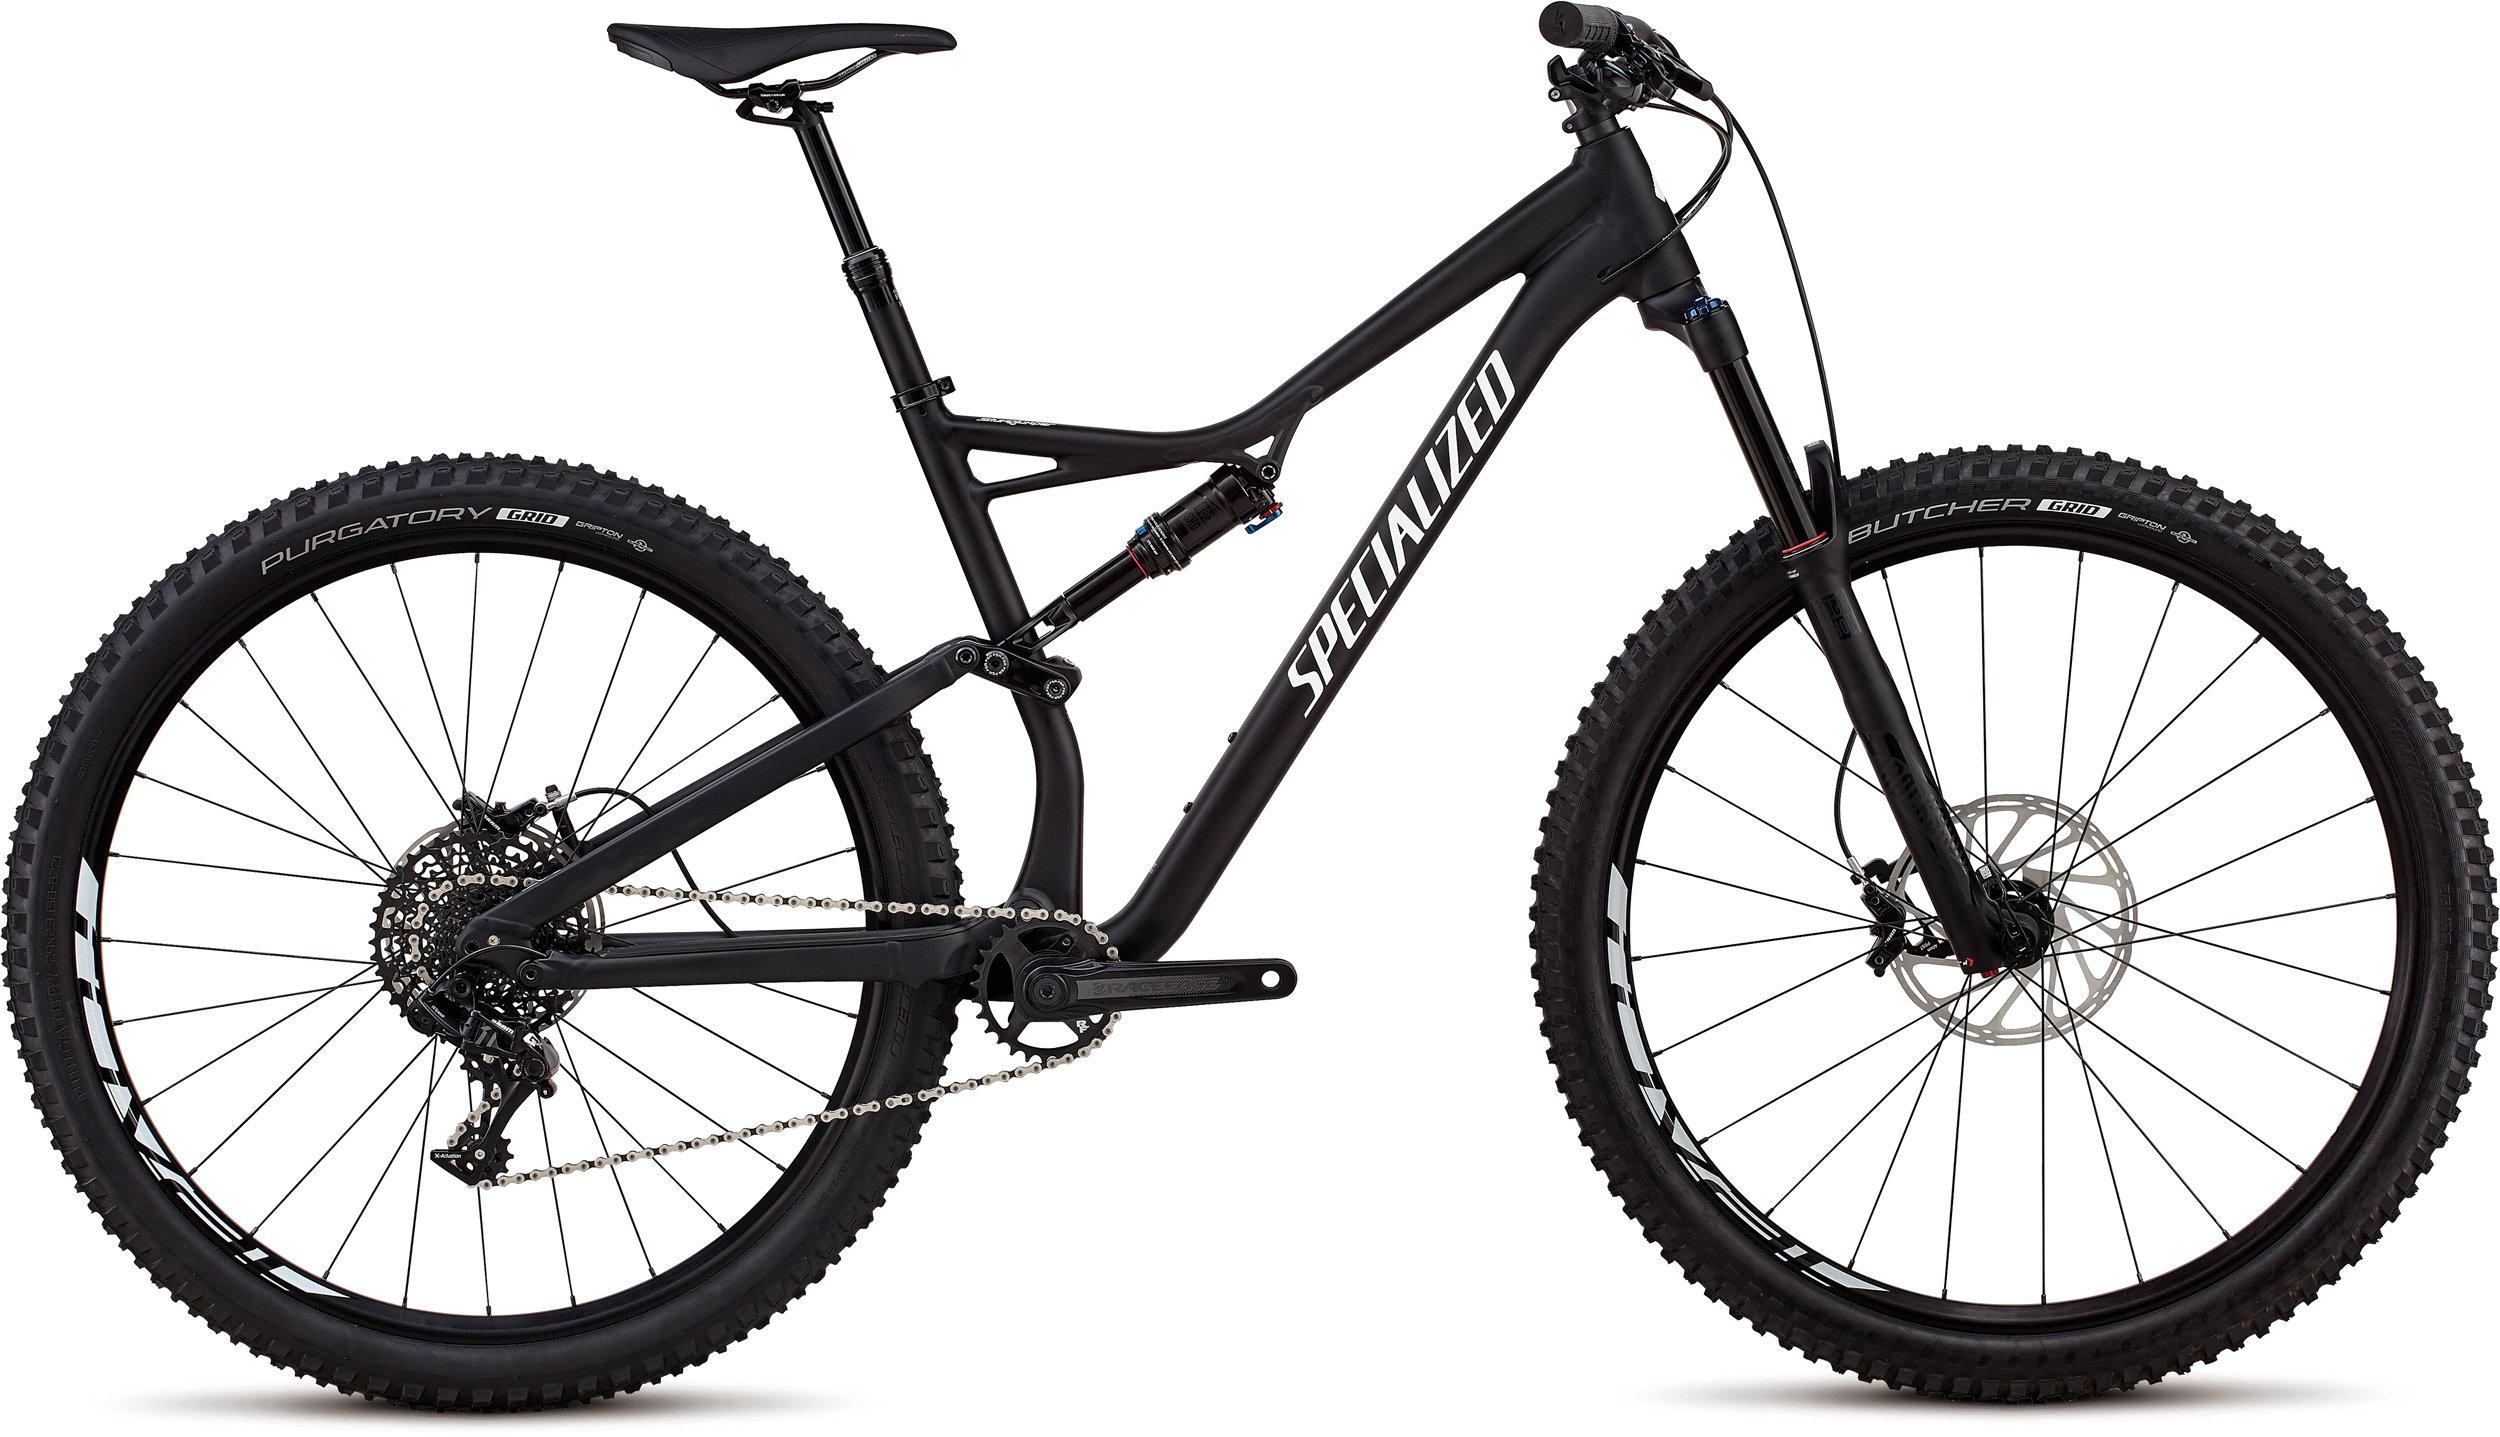 Specialized Stumpjumper Comp Alloy 29/6Fattie SATIN BLACK / WHITE CLEAN L - Pulsschlag Bike+Sport